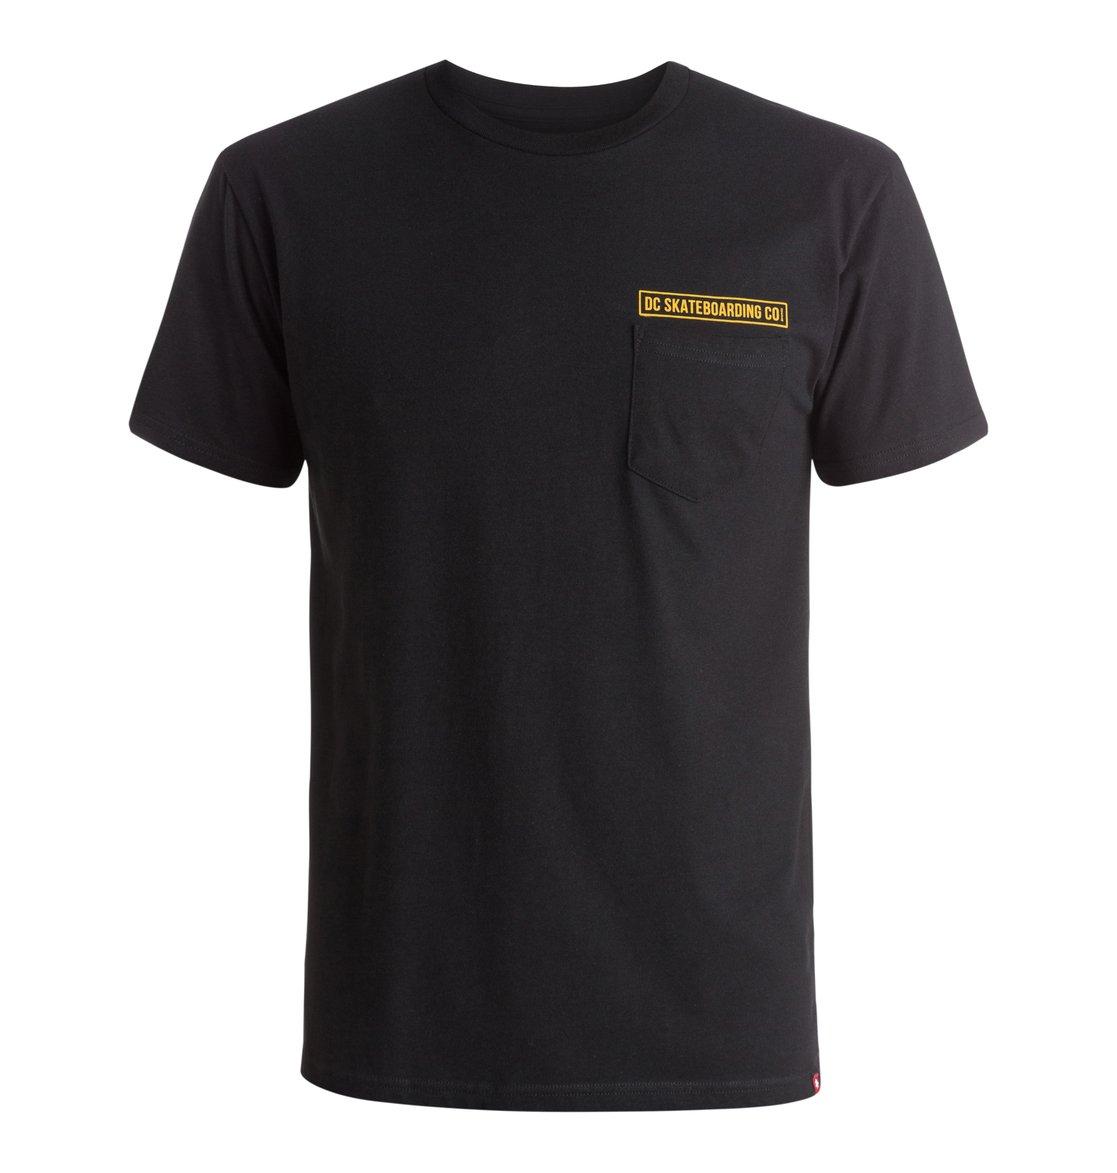 The Company T-Shirt